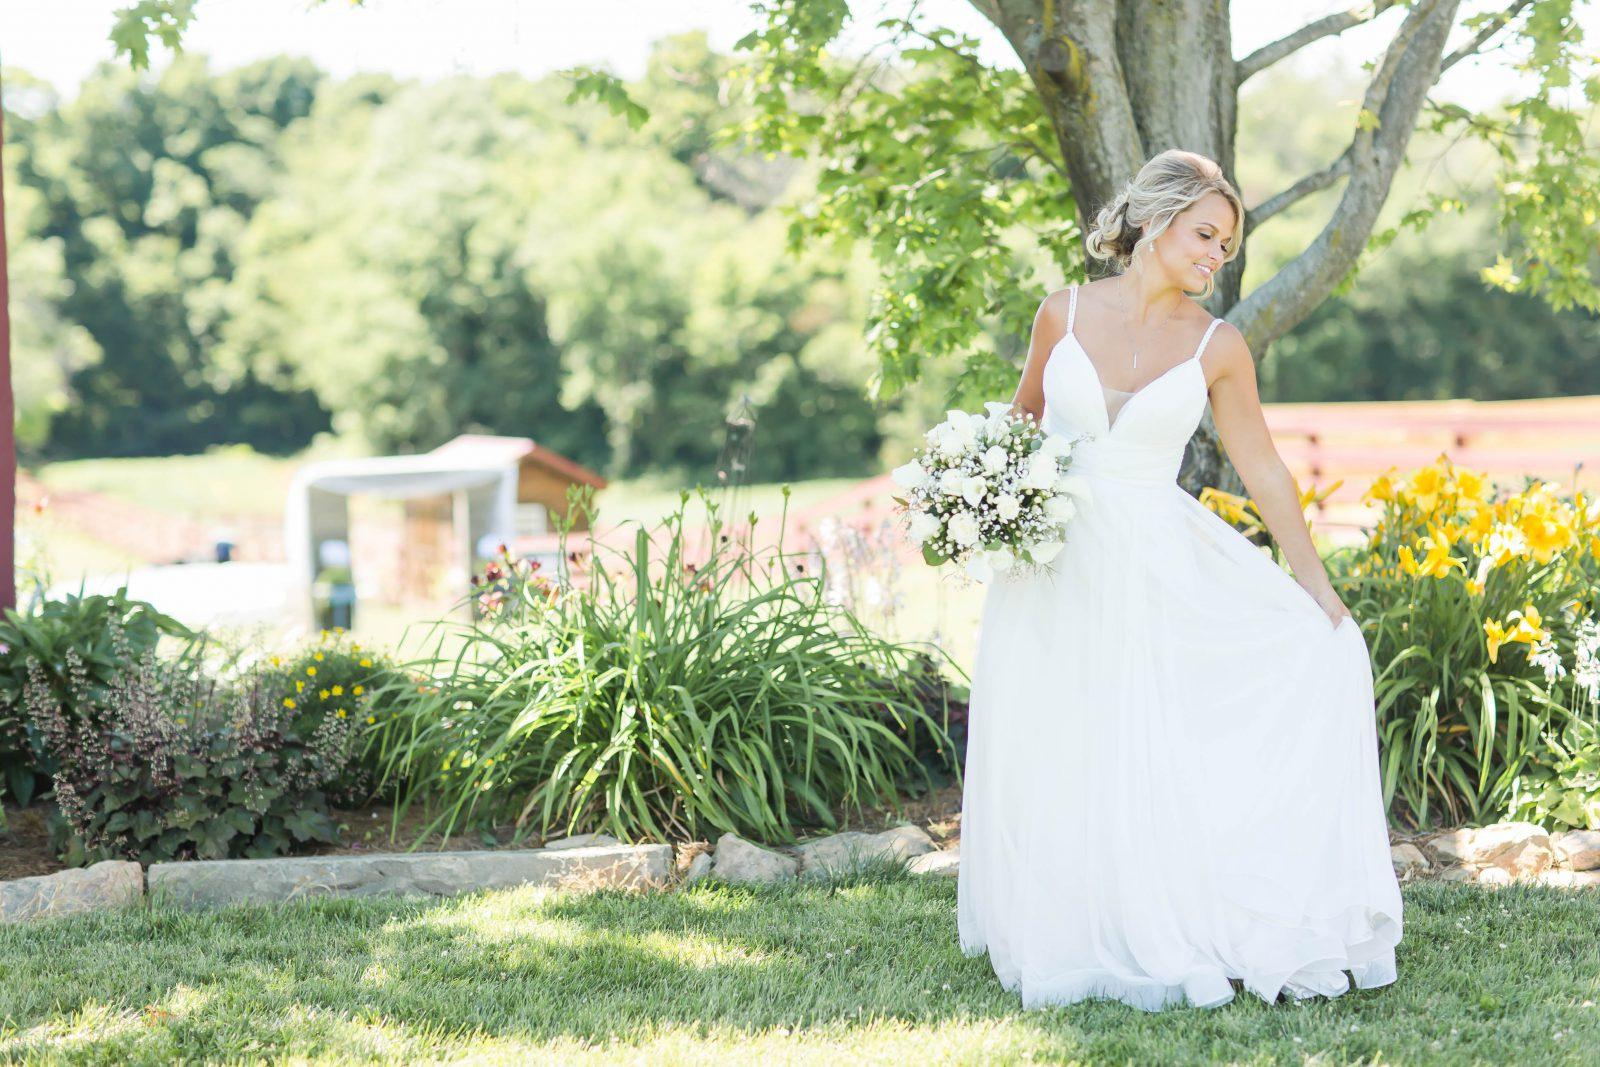 peacock-ridge-summer-wedding-photographer-akron-ohio-loren-jackson-photography-59